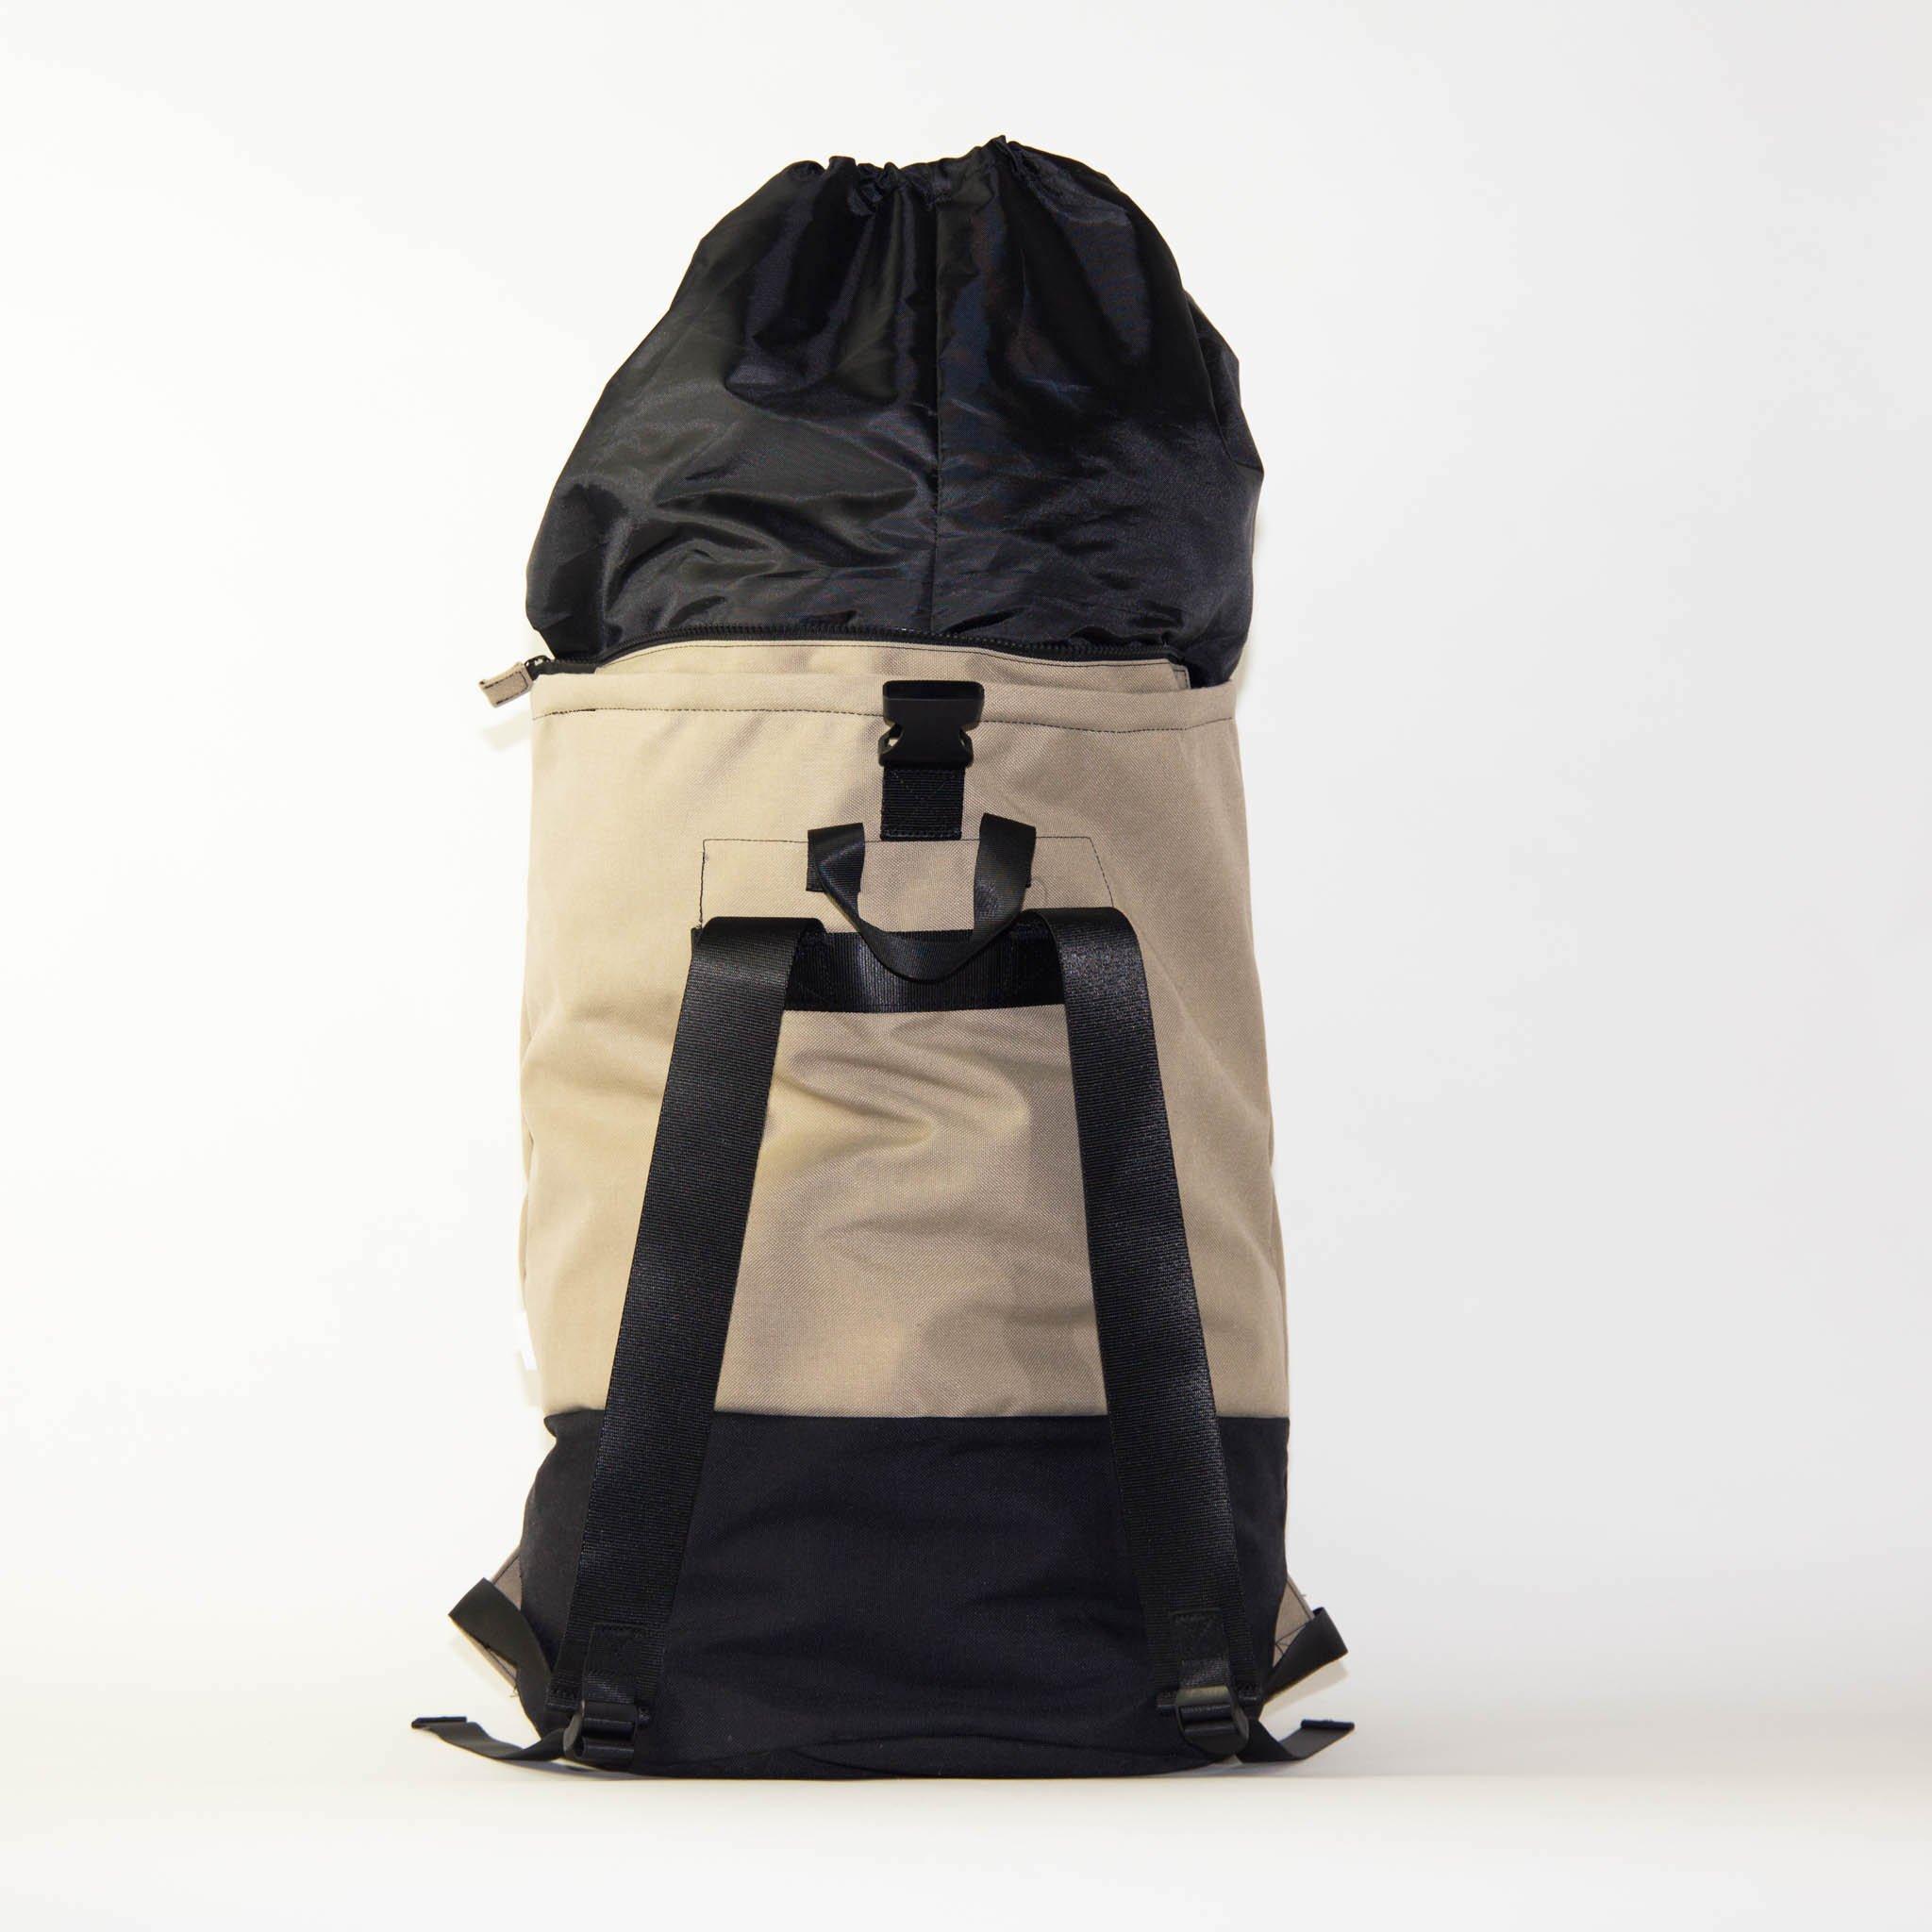 Details about StramperBAG   Laundry bag   College laundry backpack and  hamper  